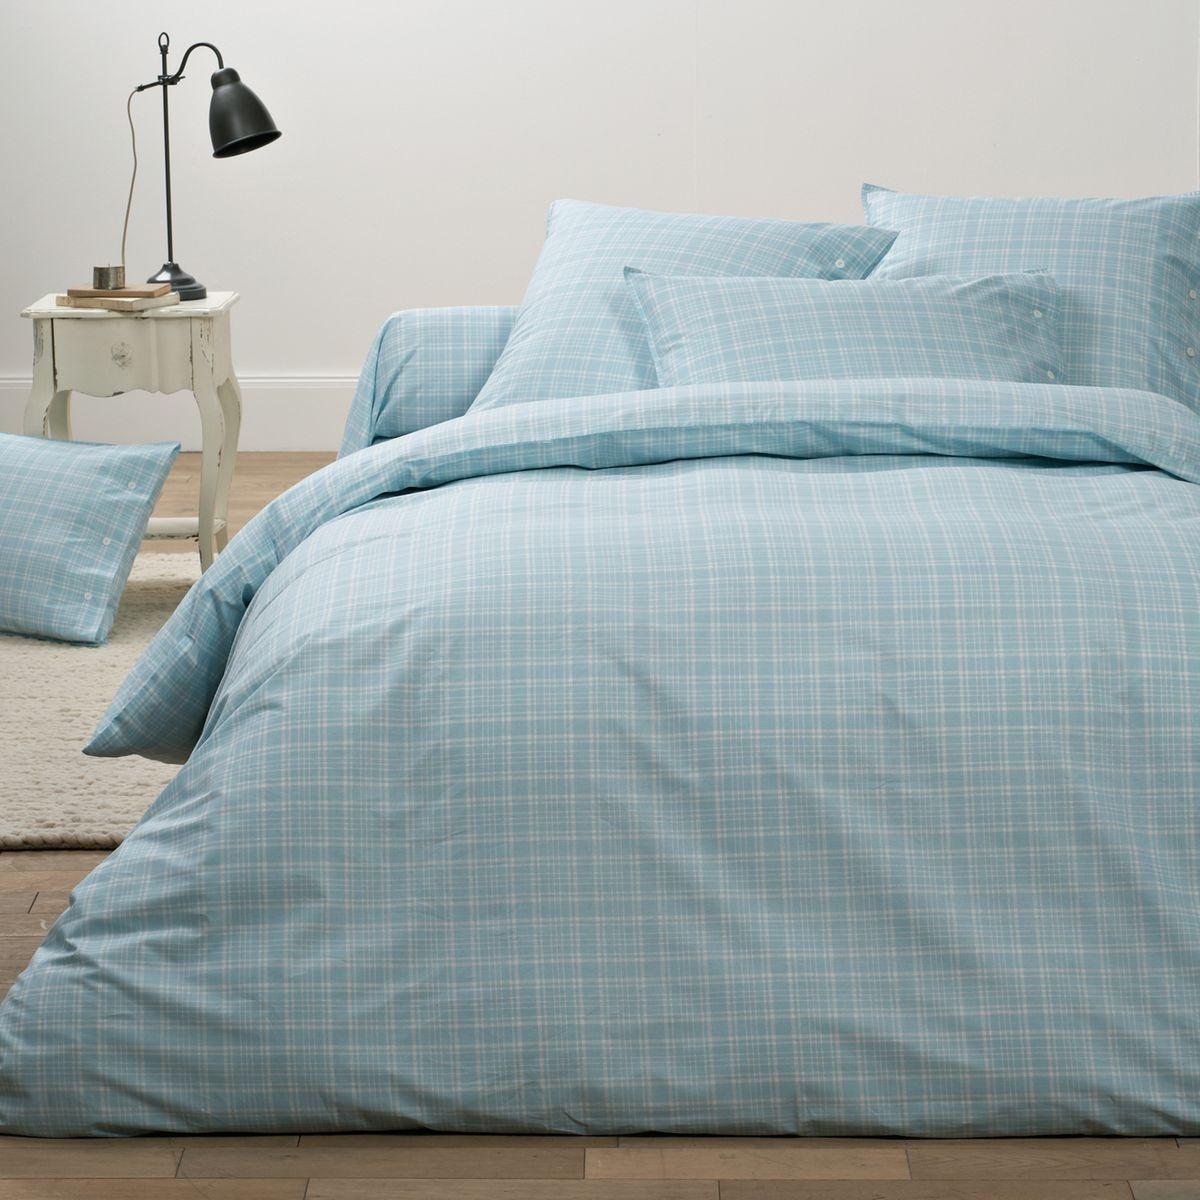 prix des housse couette 100. Black Bedroom Furniture Sets. Home Design Ideas